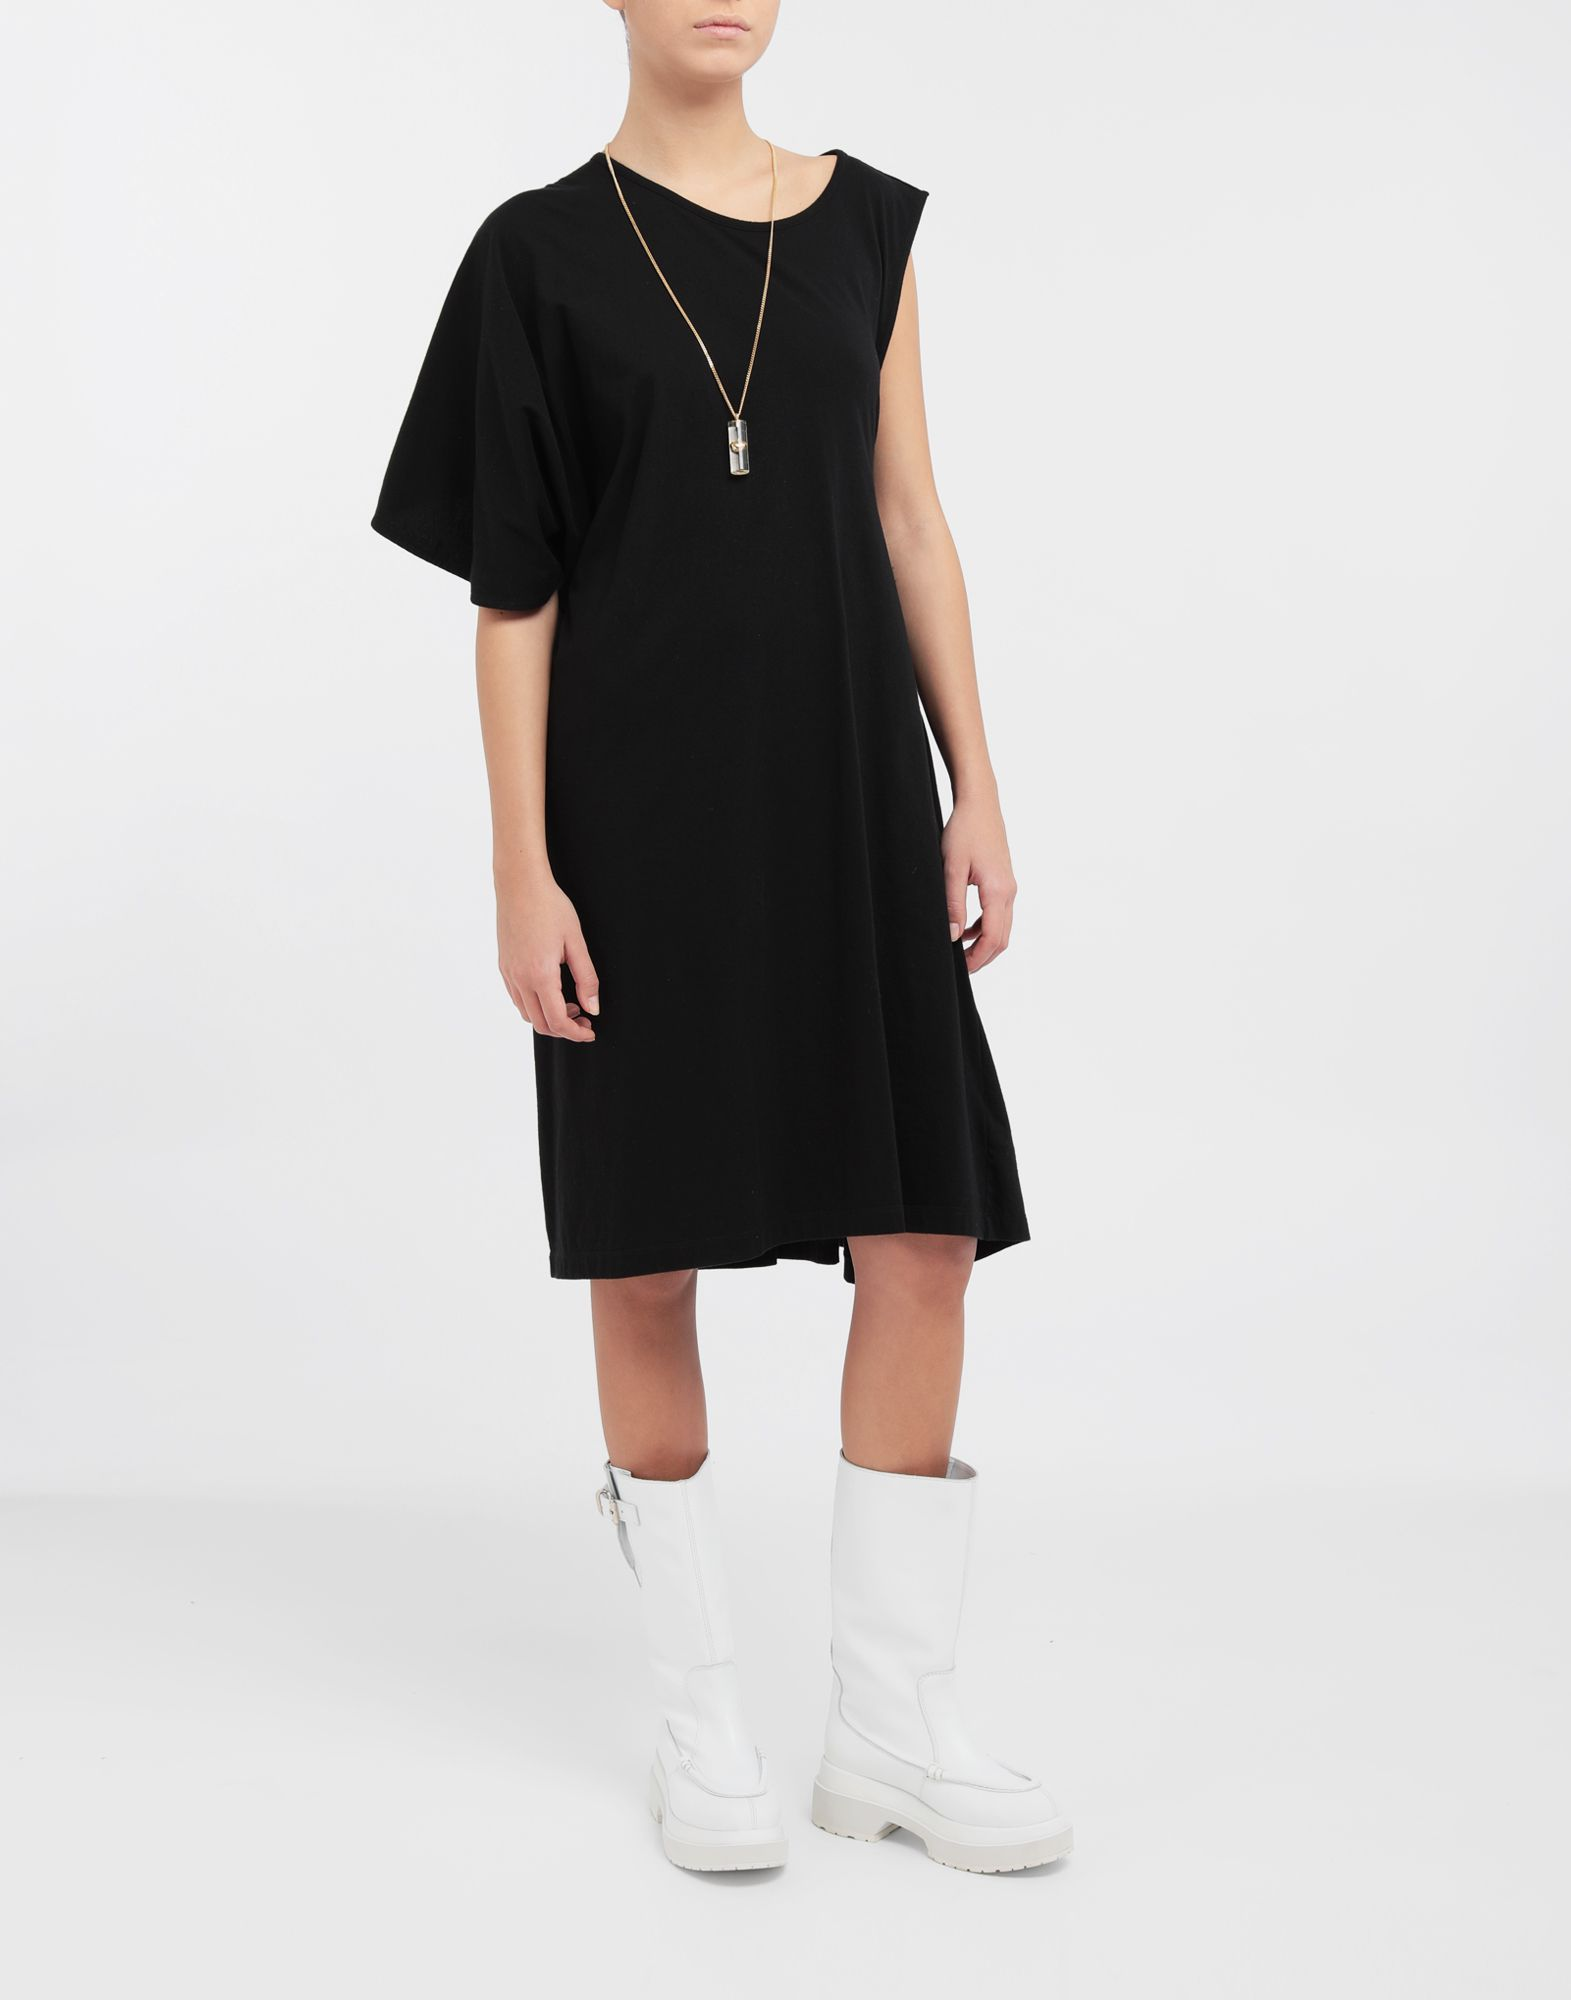 MM6 MAISON MARGIELA Asymmetrical jersey midi dress 3/4 length dress Woman d